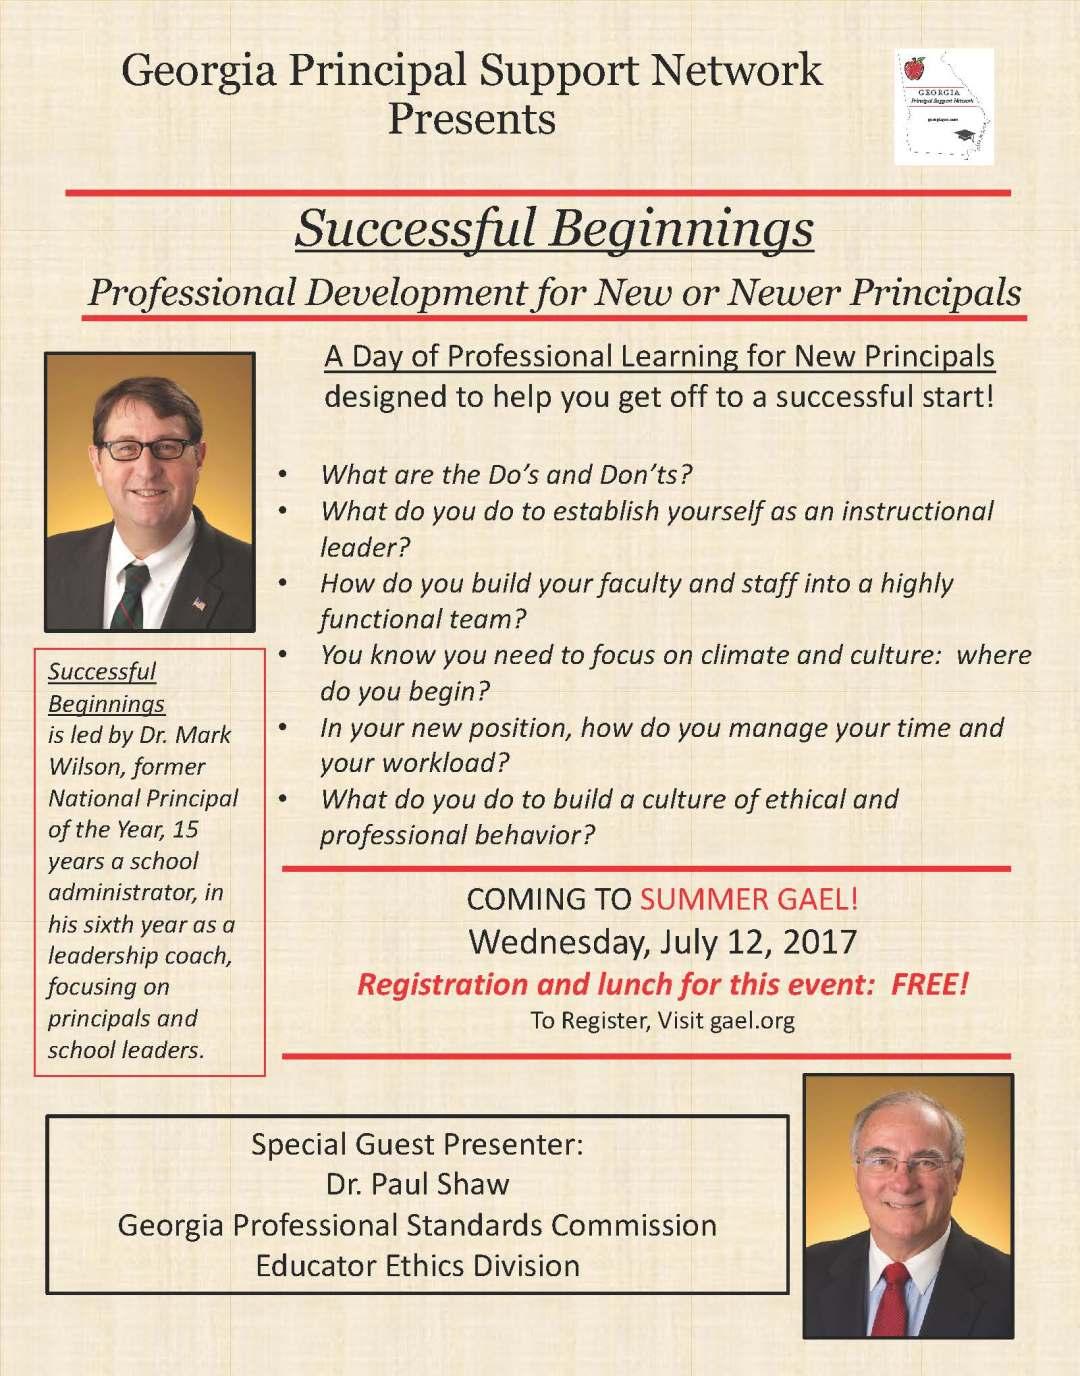 Successful Beginnings Summer GAEL 2017